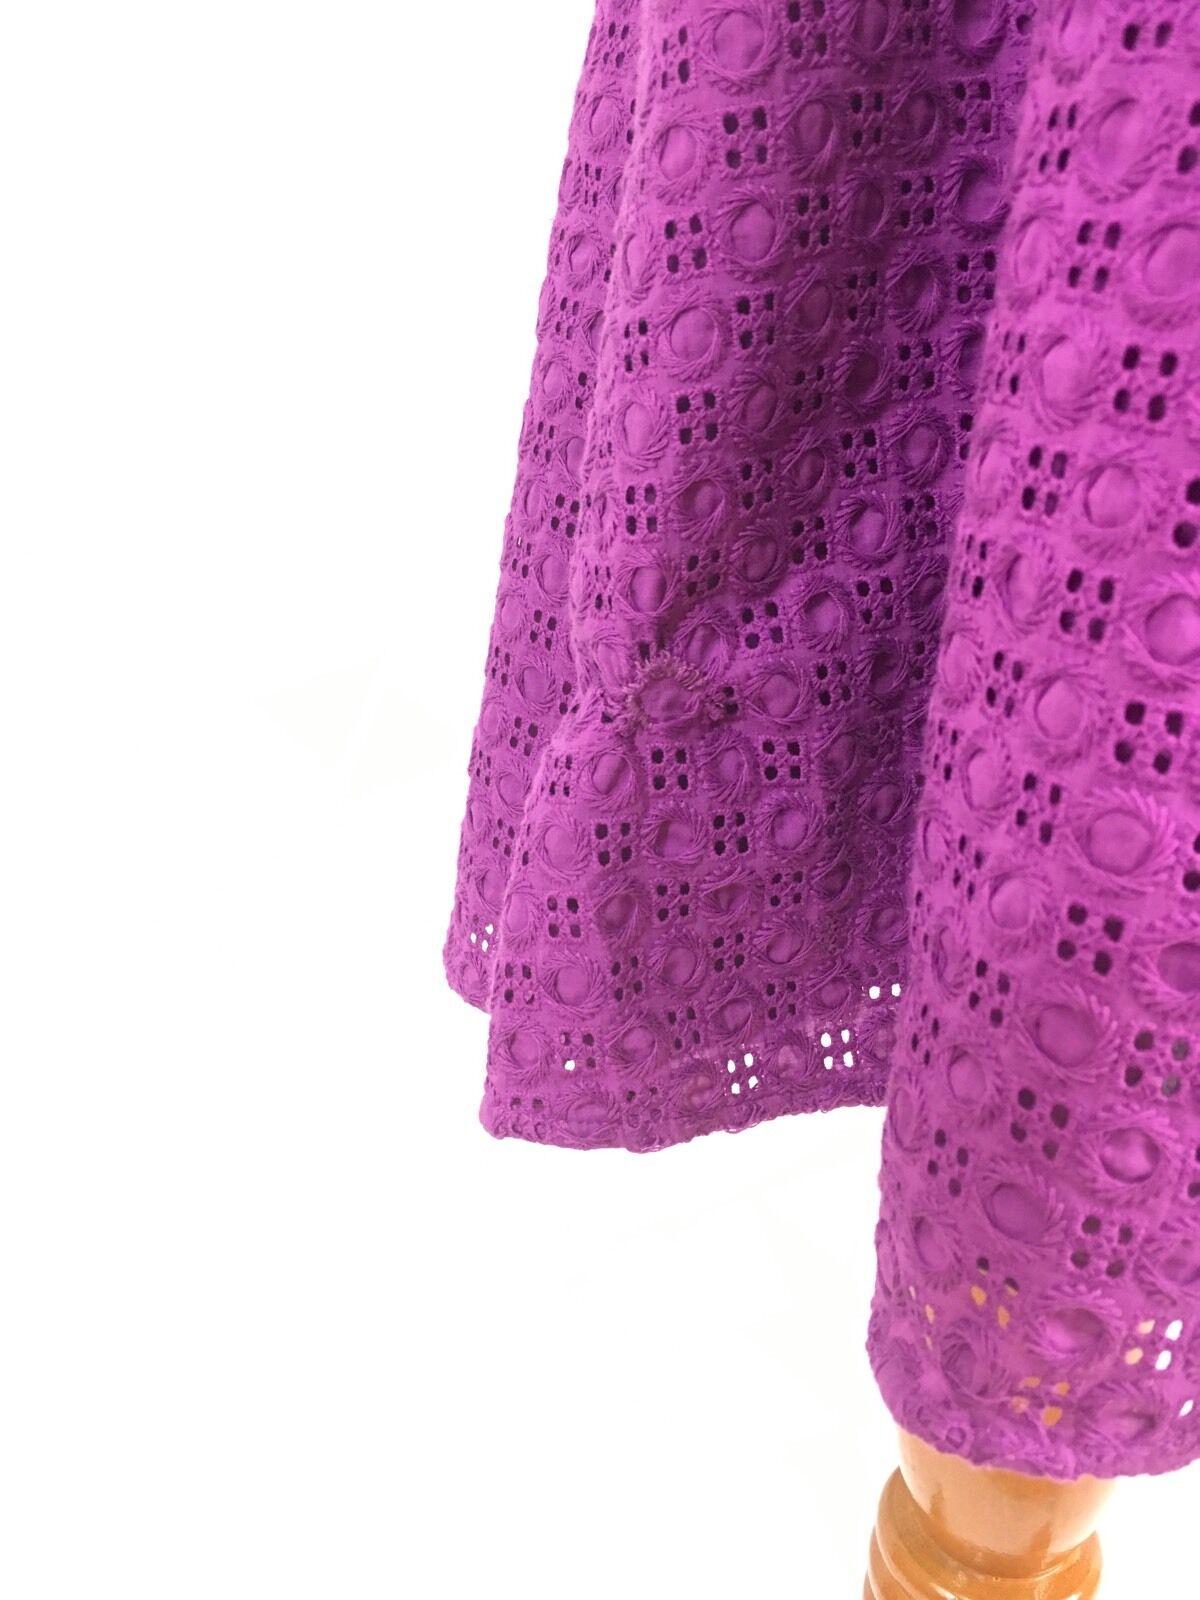 Cynthia rowley dress 14 purple purple purple sleeveless embroidered shift A line skirt knee f57bb1